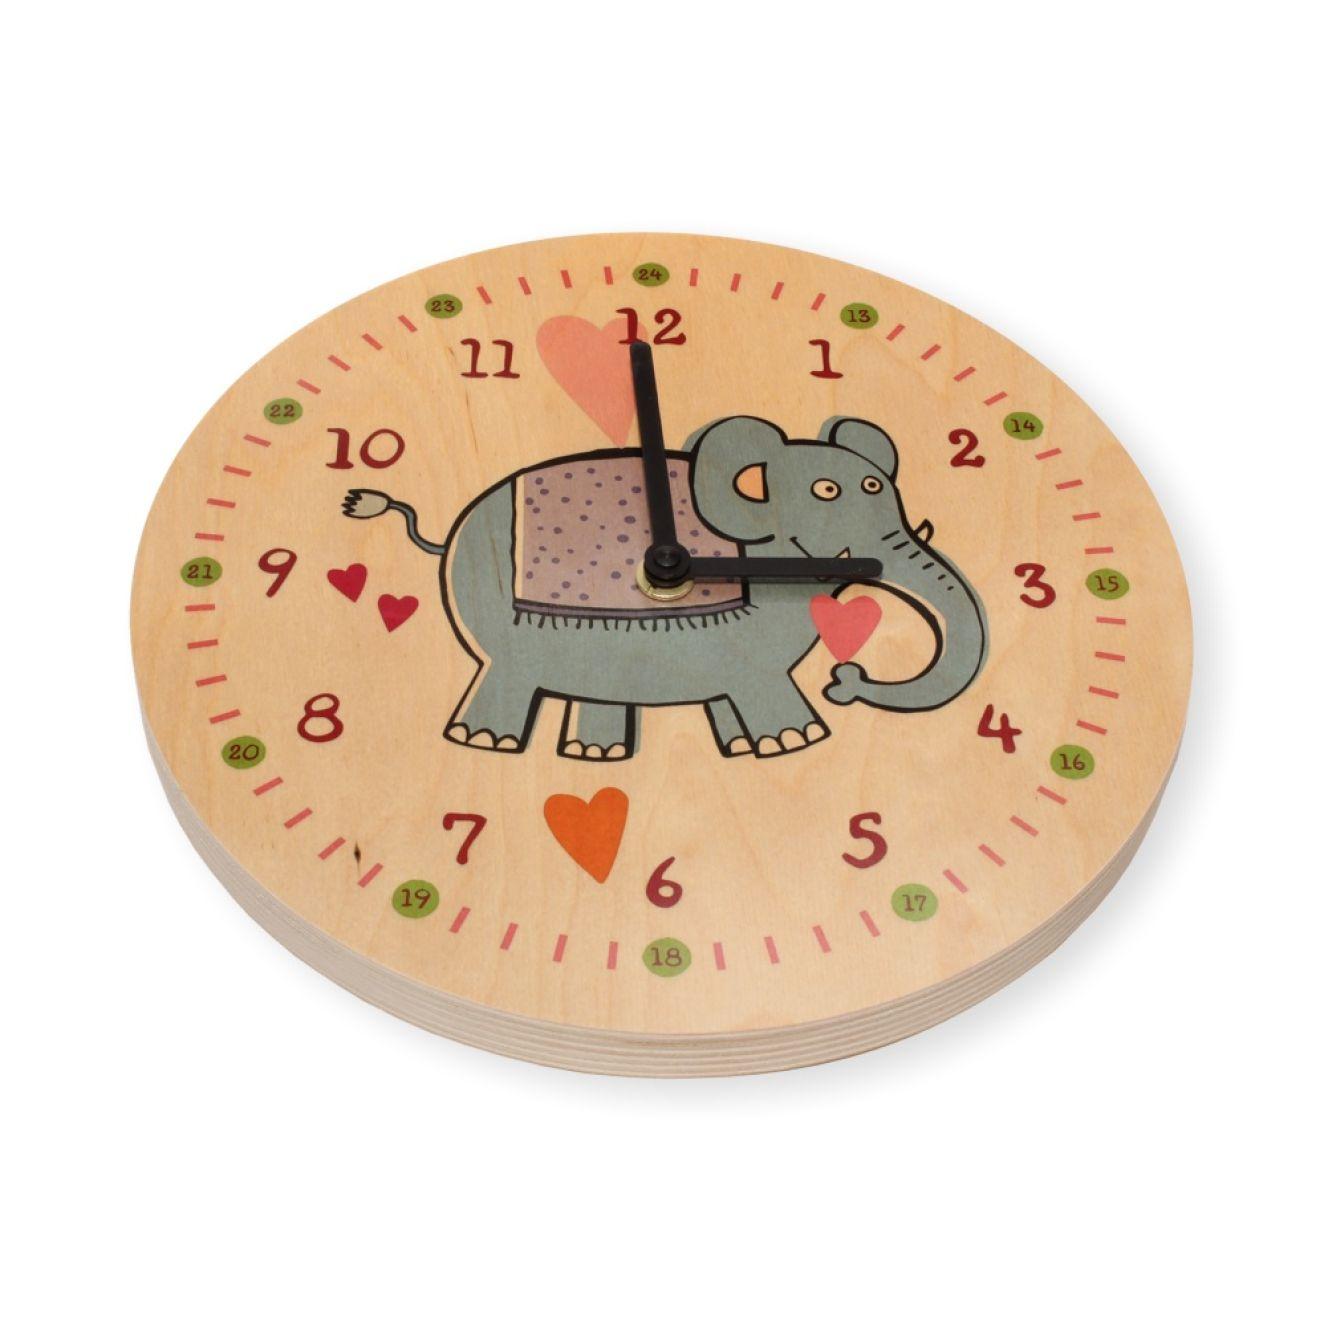 Wanduhr Uhr Holz Kinder Kinderzimmer Kinderuhr ~ Wanduhr Kinderzimmer Elefant Holz Uhr Kinder Kinderuhr, wertprodukte